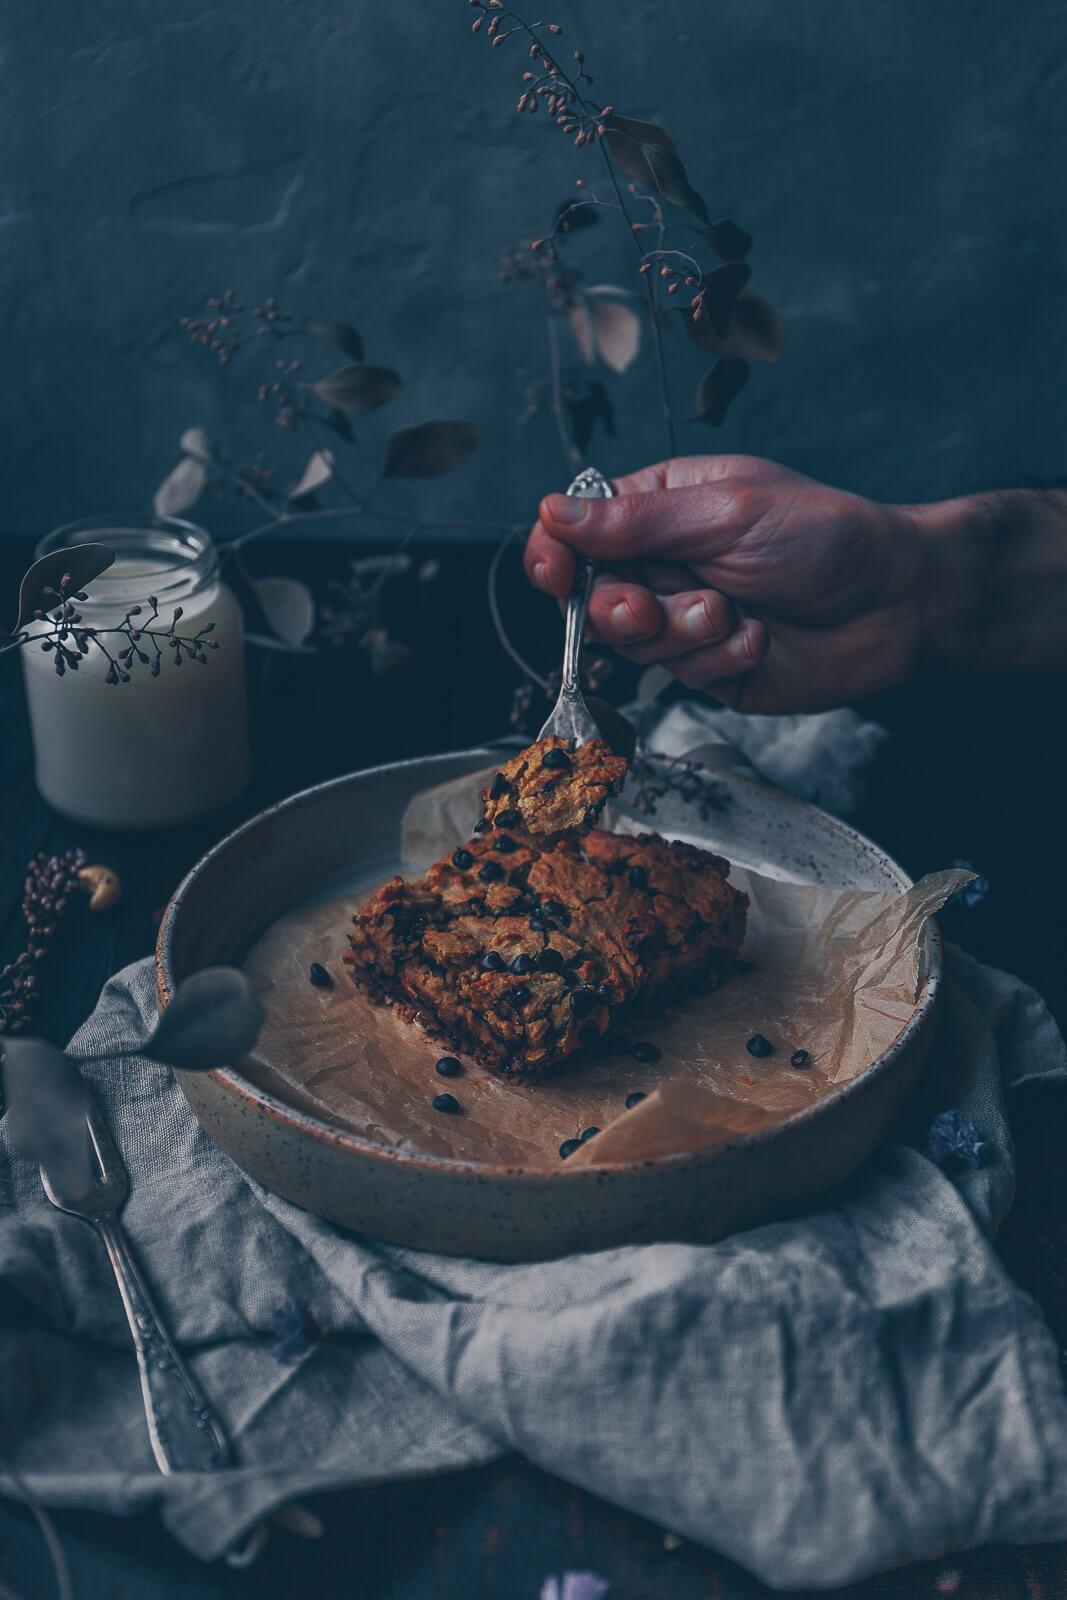 Kichererbsen-Blondies, Kichererbsen Blondies, Kichererbsen Kuchen, Kichererbsen süß backen, Kichererbsen backen, Kichererbsen Kuchen backen, Kichererbsen backen Rezept, Protein Kuchen vegan, Protein Kuchen, Rezept veganer Kuchen Kichererbsen